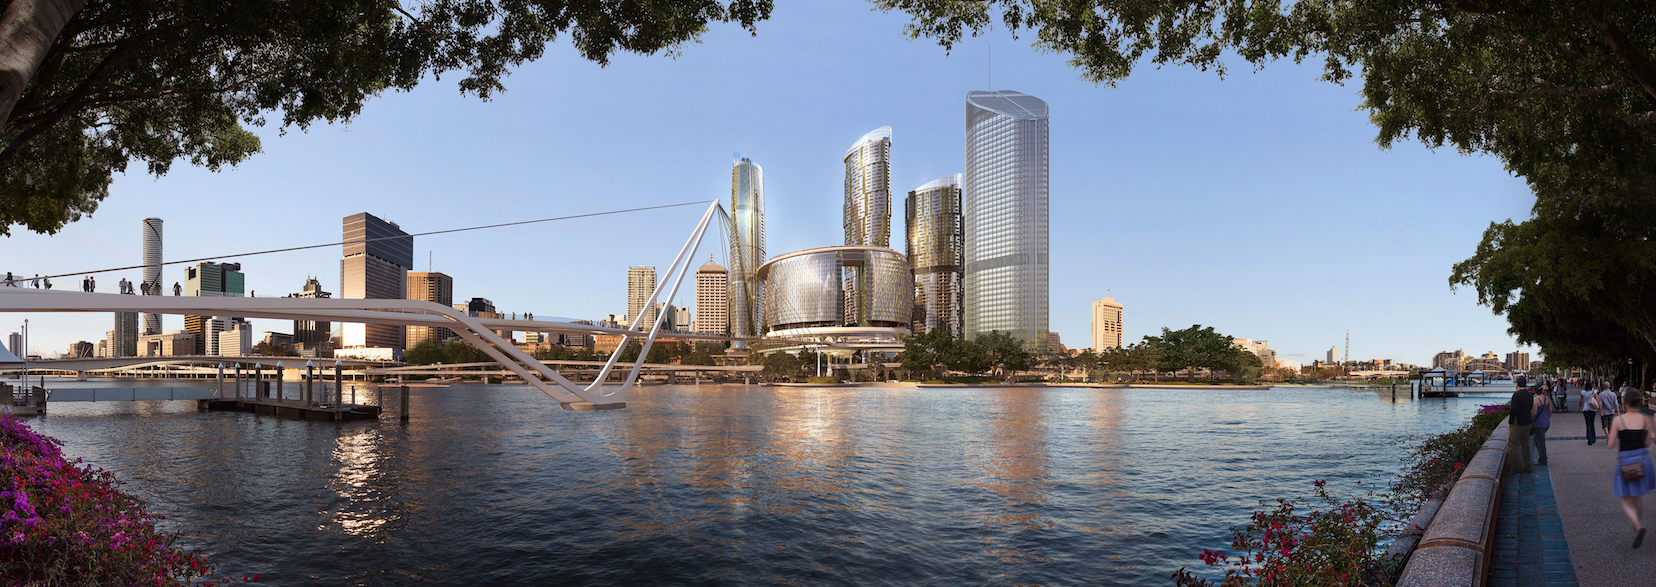 Queen's Wharf development Brisbane - Neville Bonner Bridge2